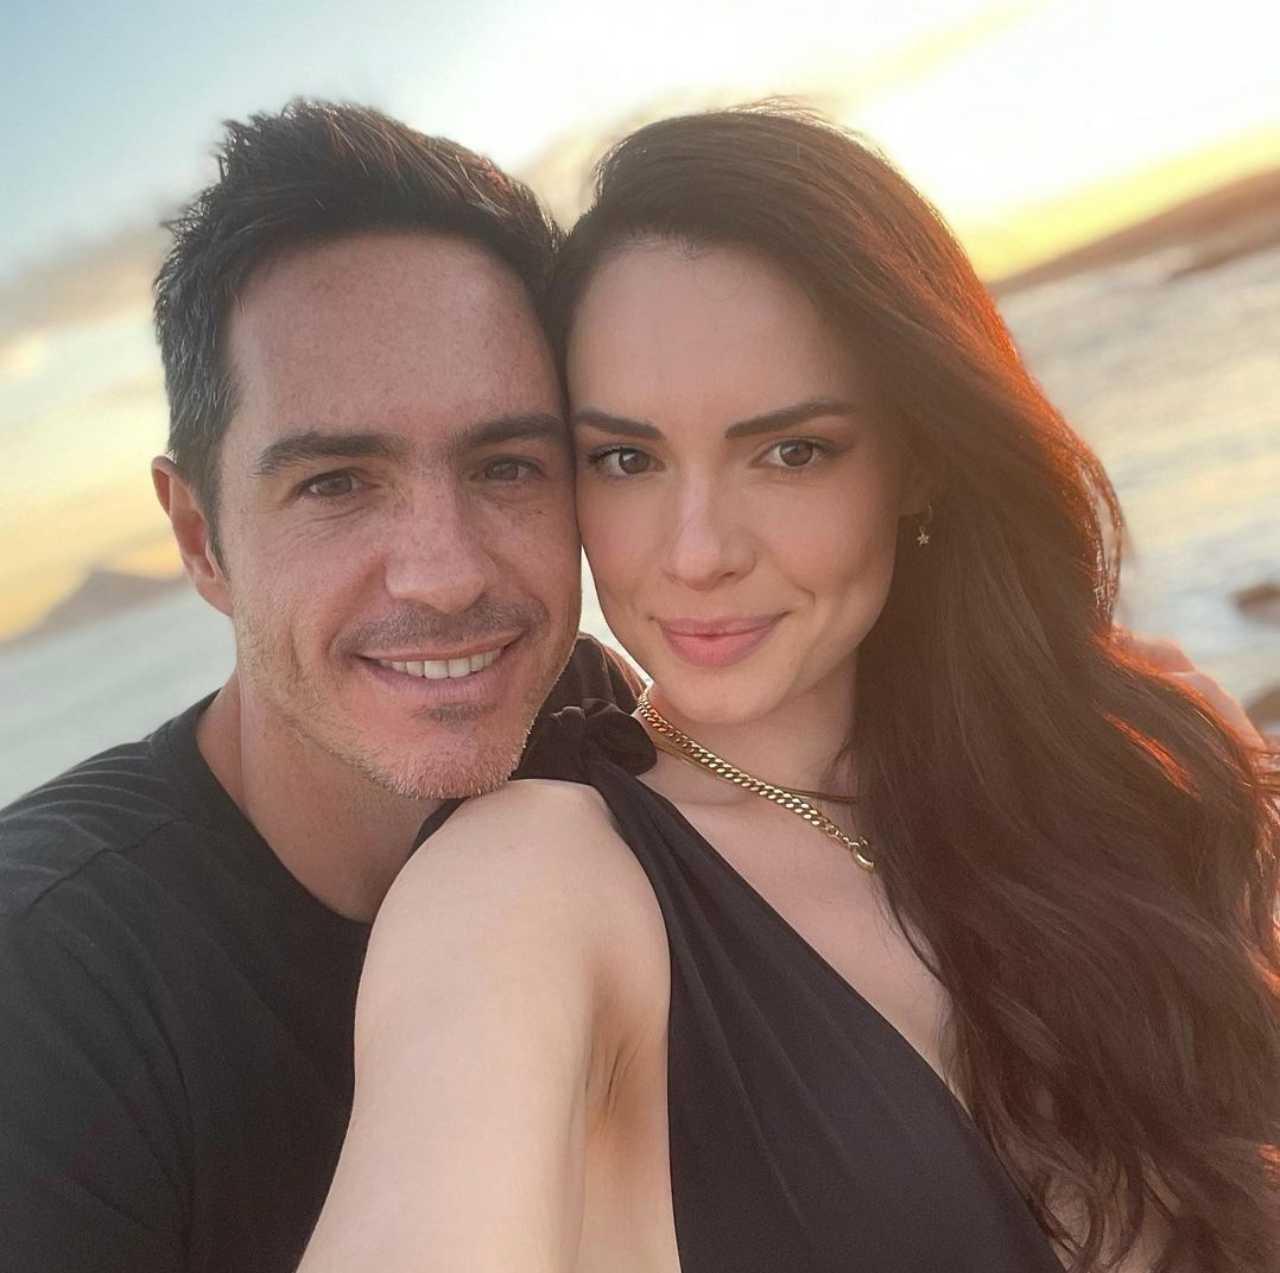 Mauricio Ochmann confirma su amor con Paulina Burrola